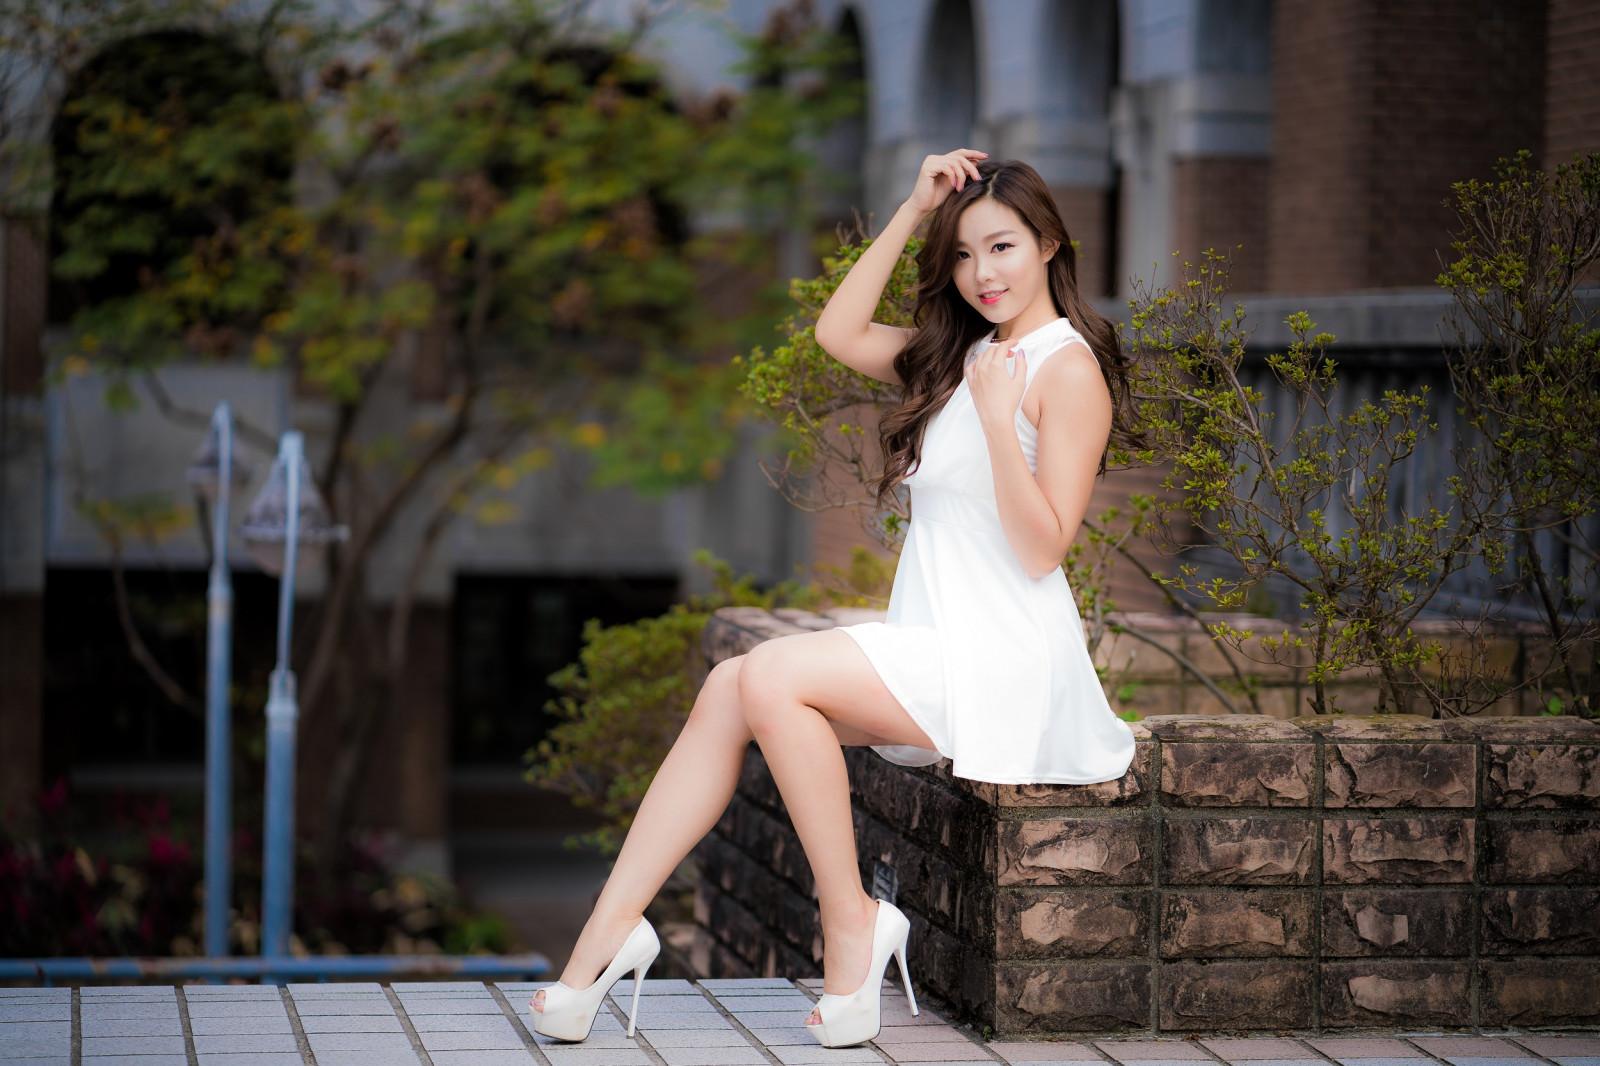 Asian 4k Ultra HD Wallpaper | Background Image | 4500x3002